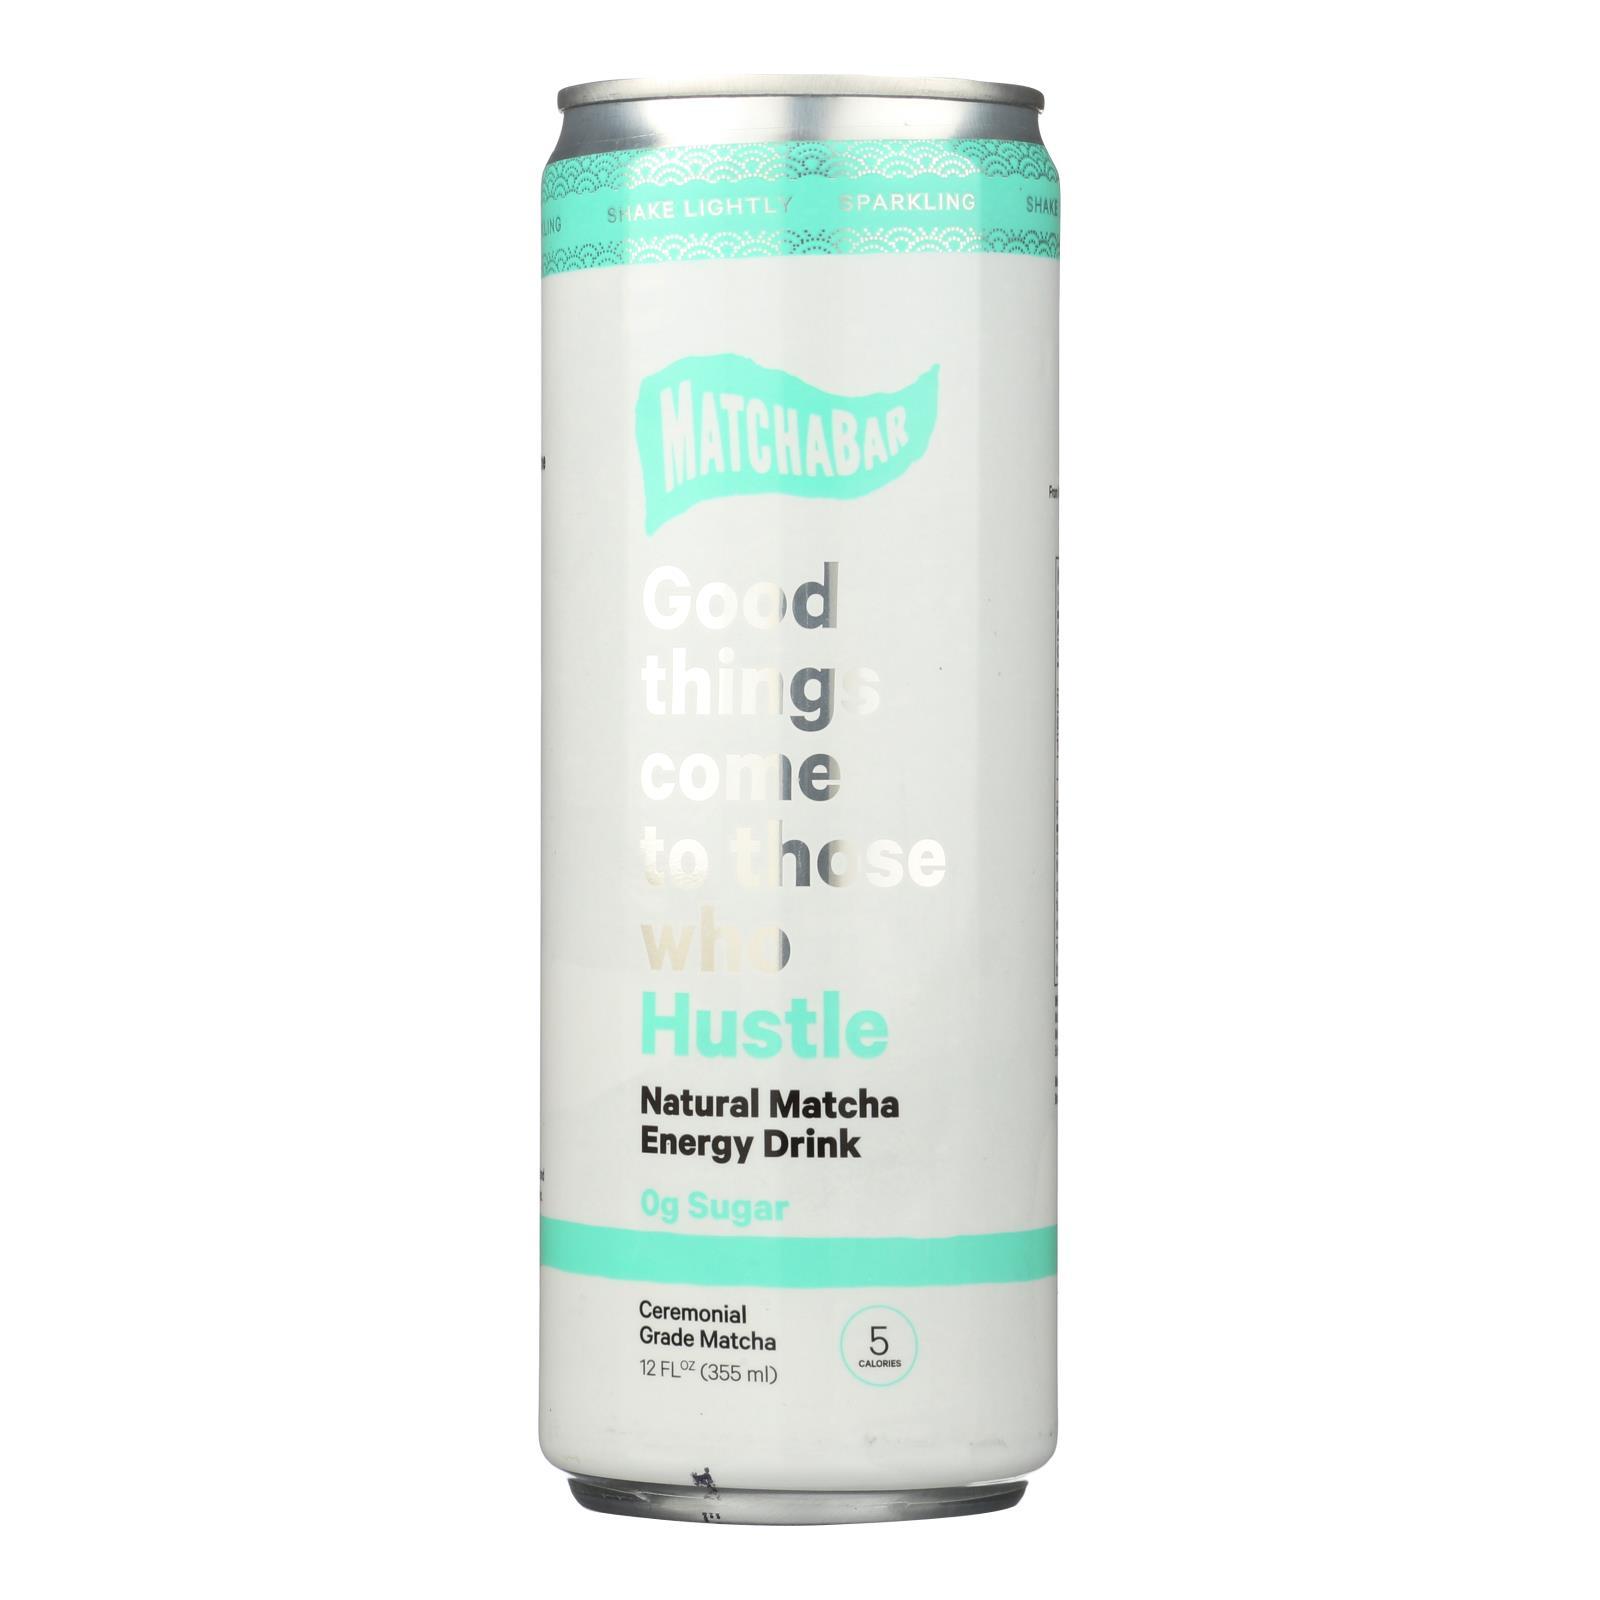 Matchabar - Energy Drink Matcha Hus 0 - Case of 12 - 12 OZ